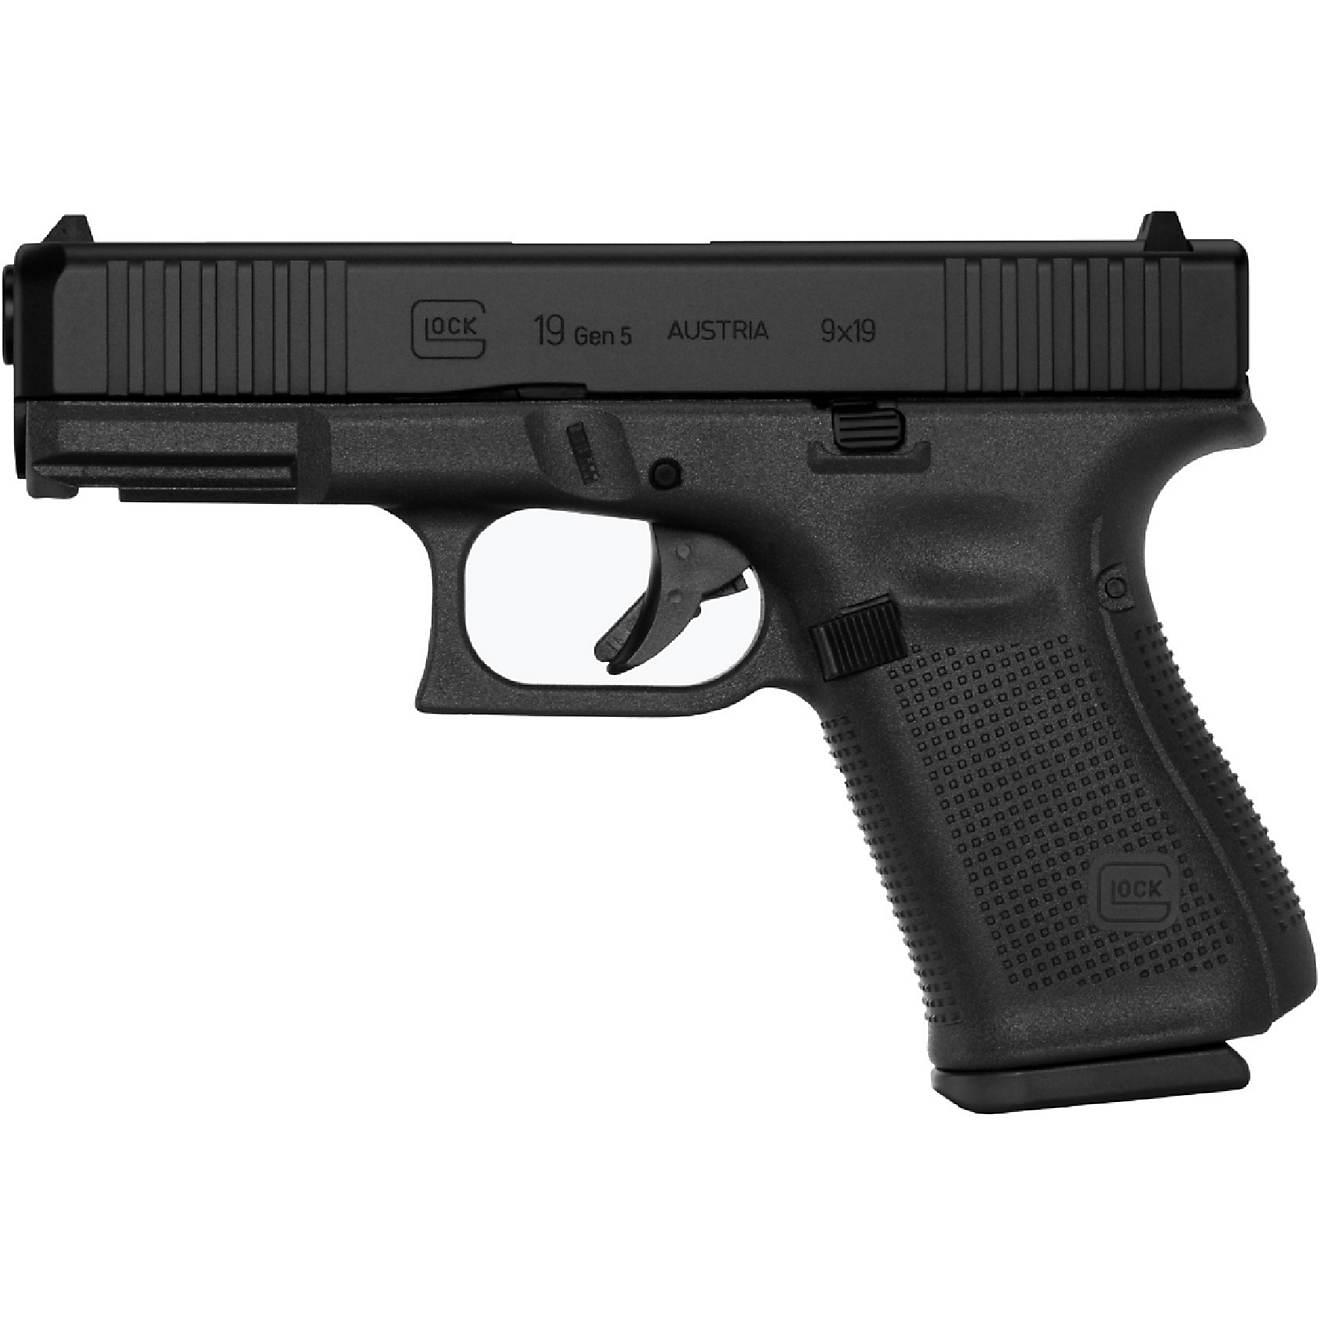 GLOCK G19 Gen5 9mm Semiautomatic Pistol                                                                                          - view number 1